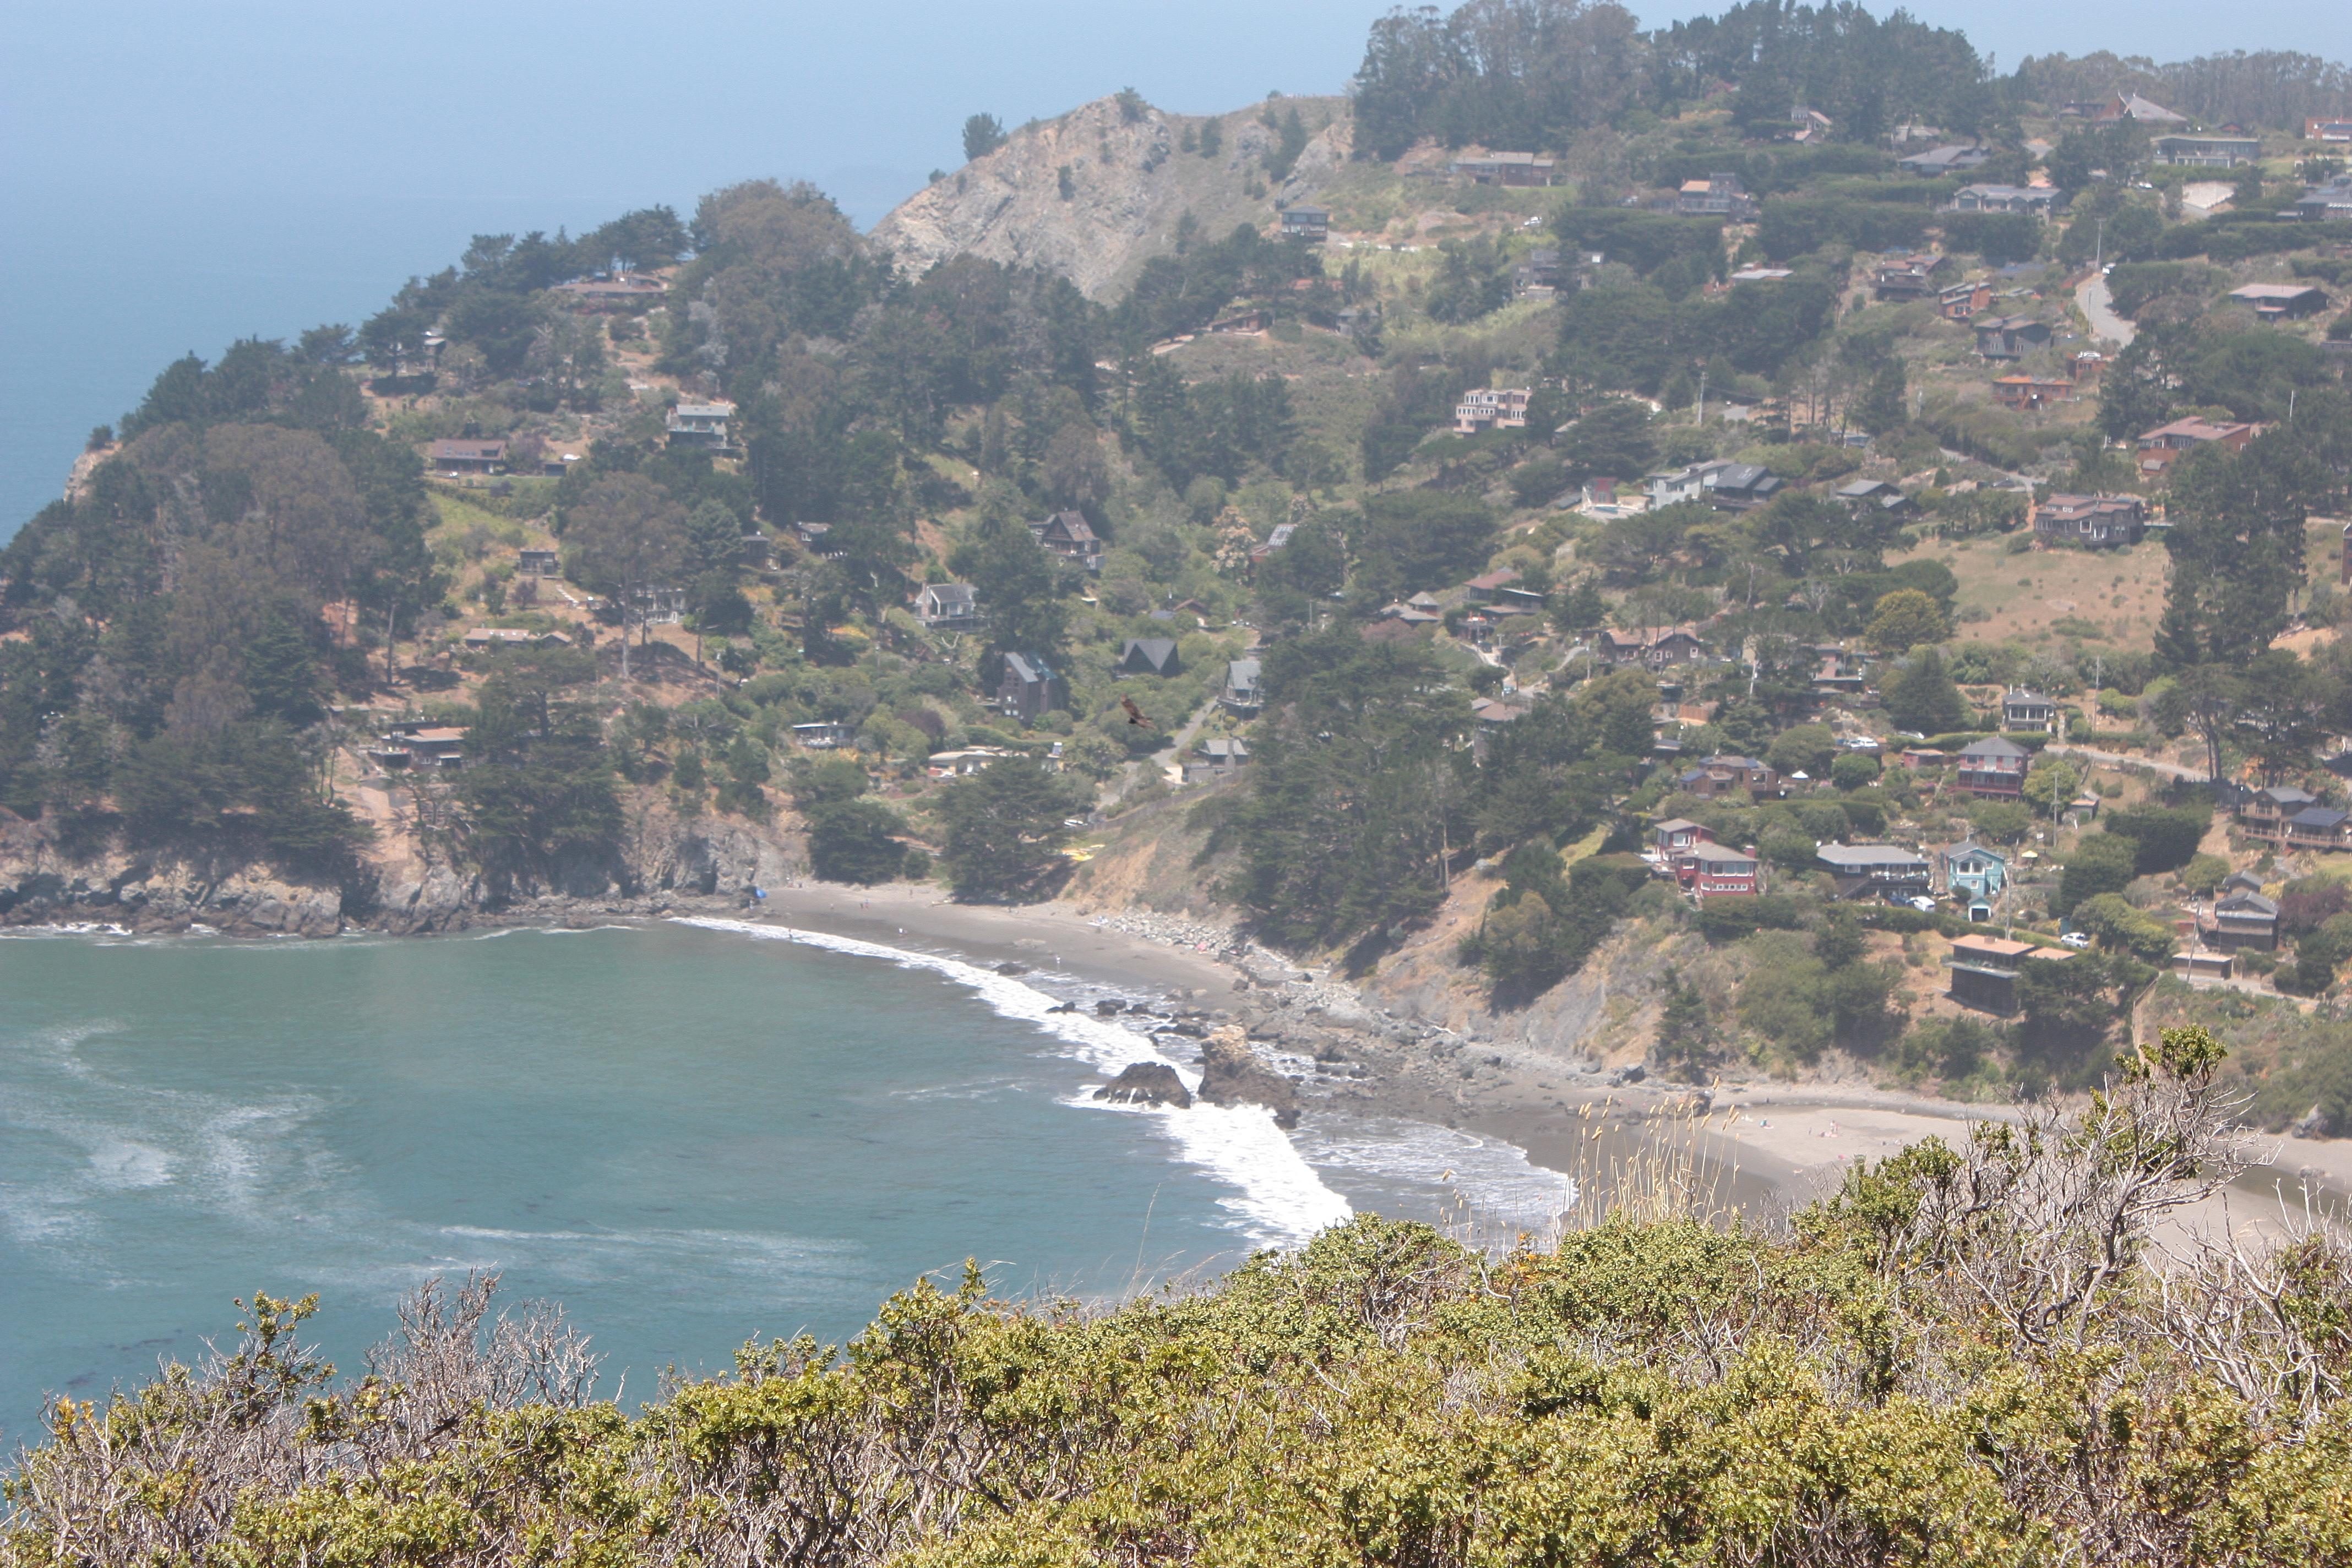 Muir_Beach_Jpg (19)